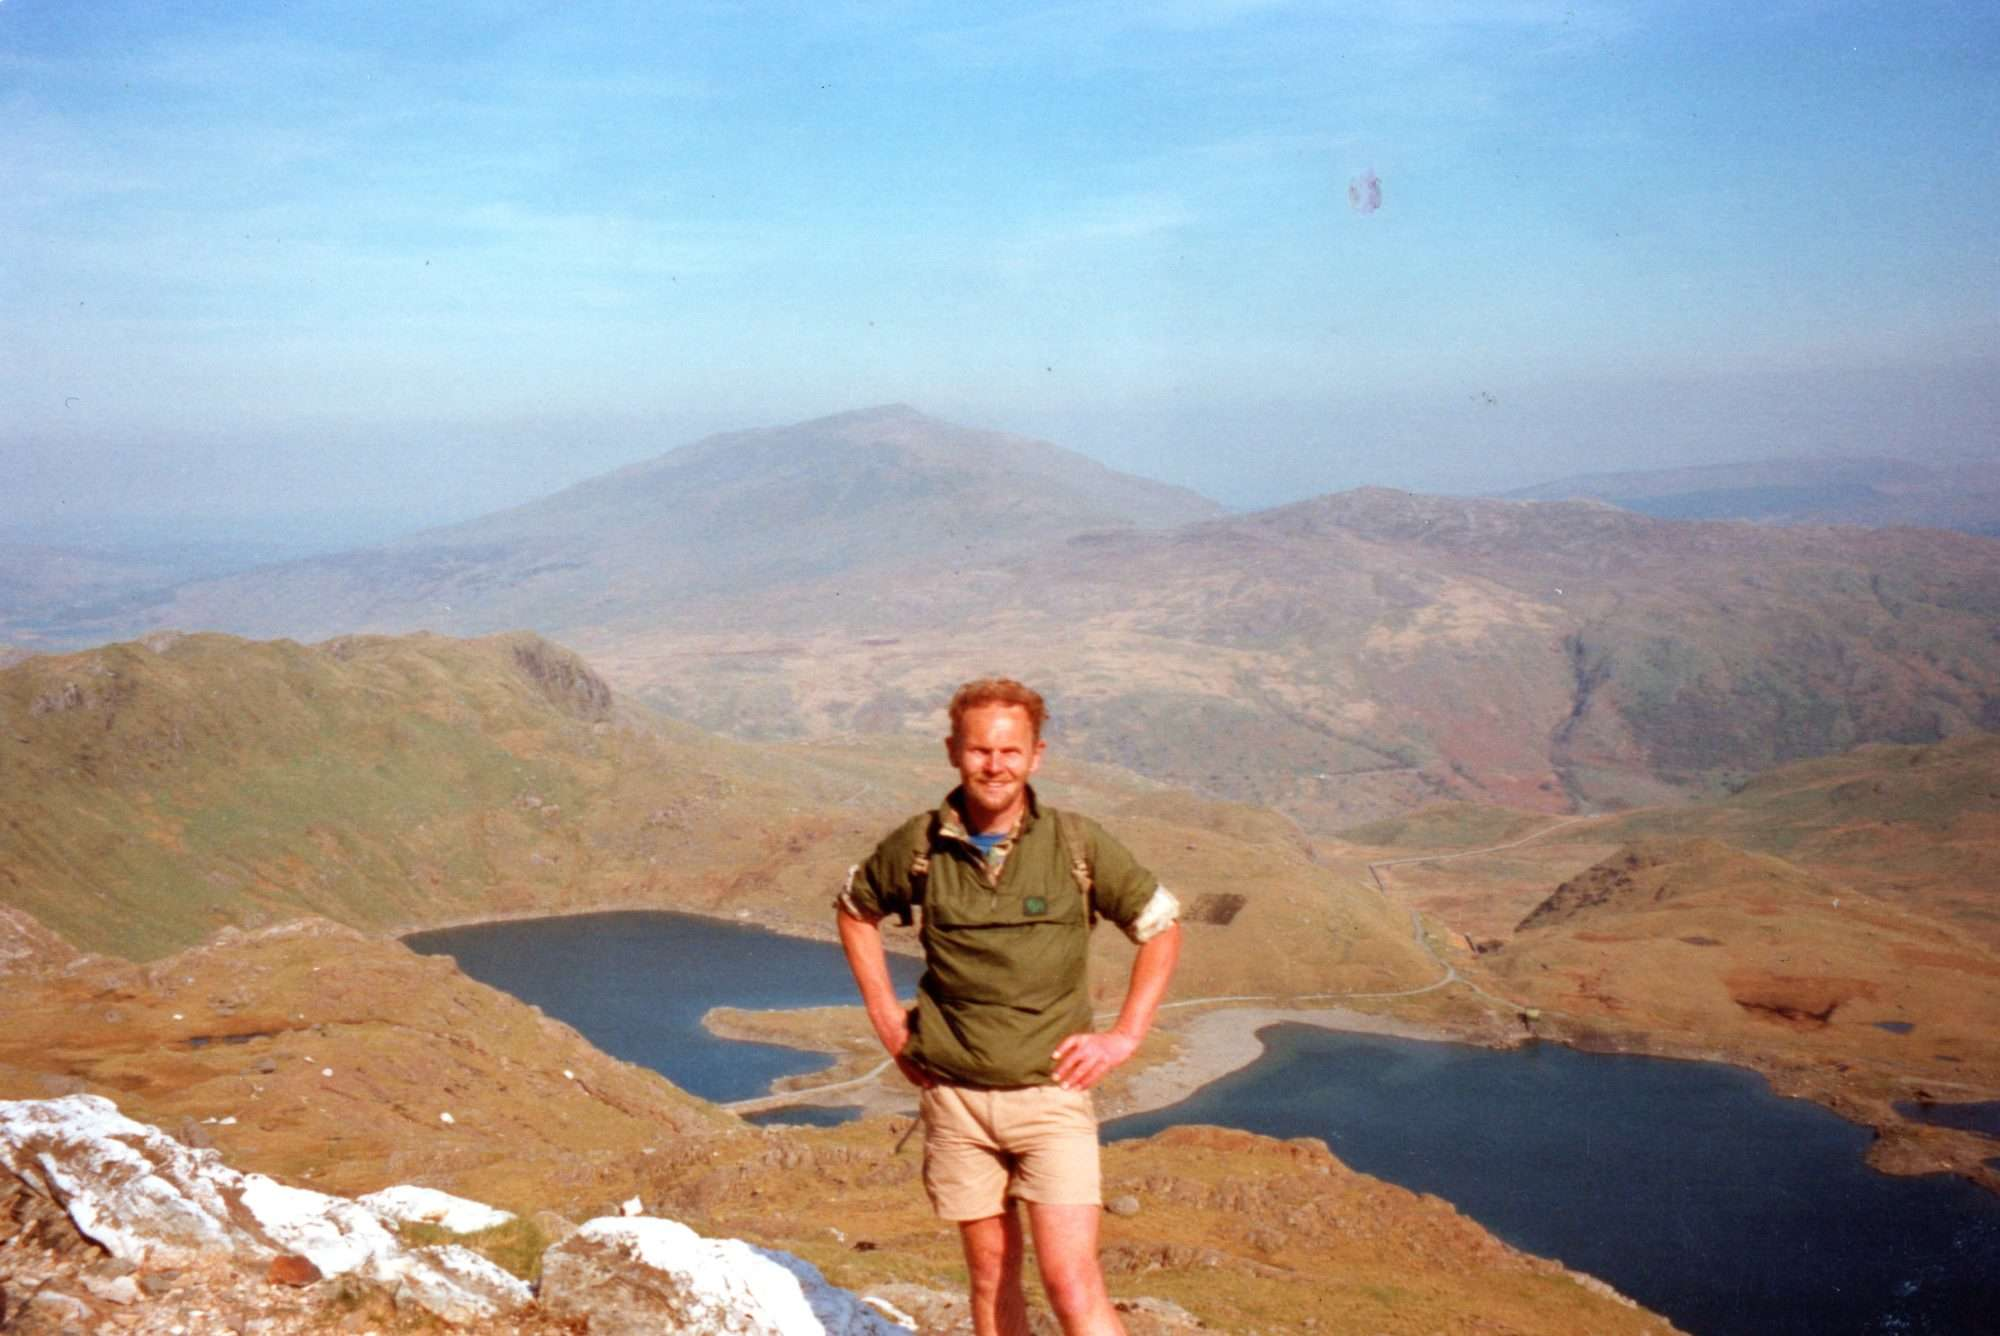 Angus walking in Snowdonia